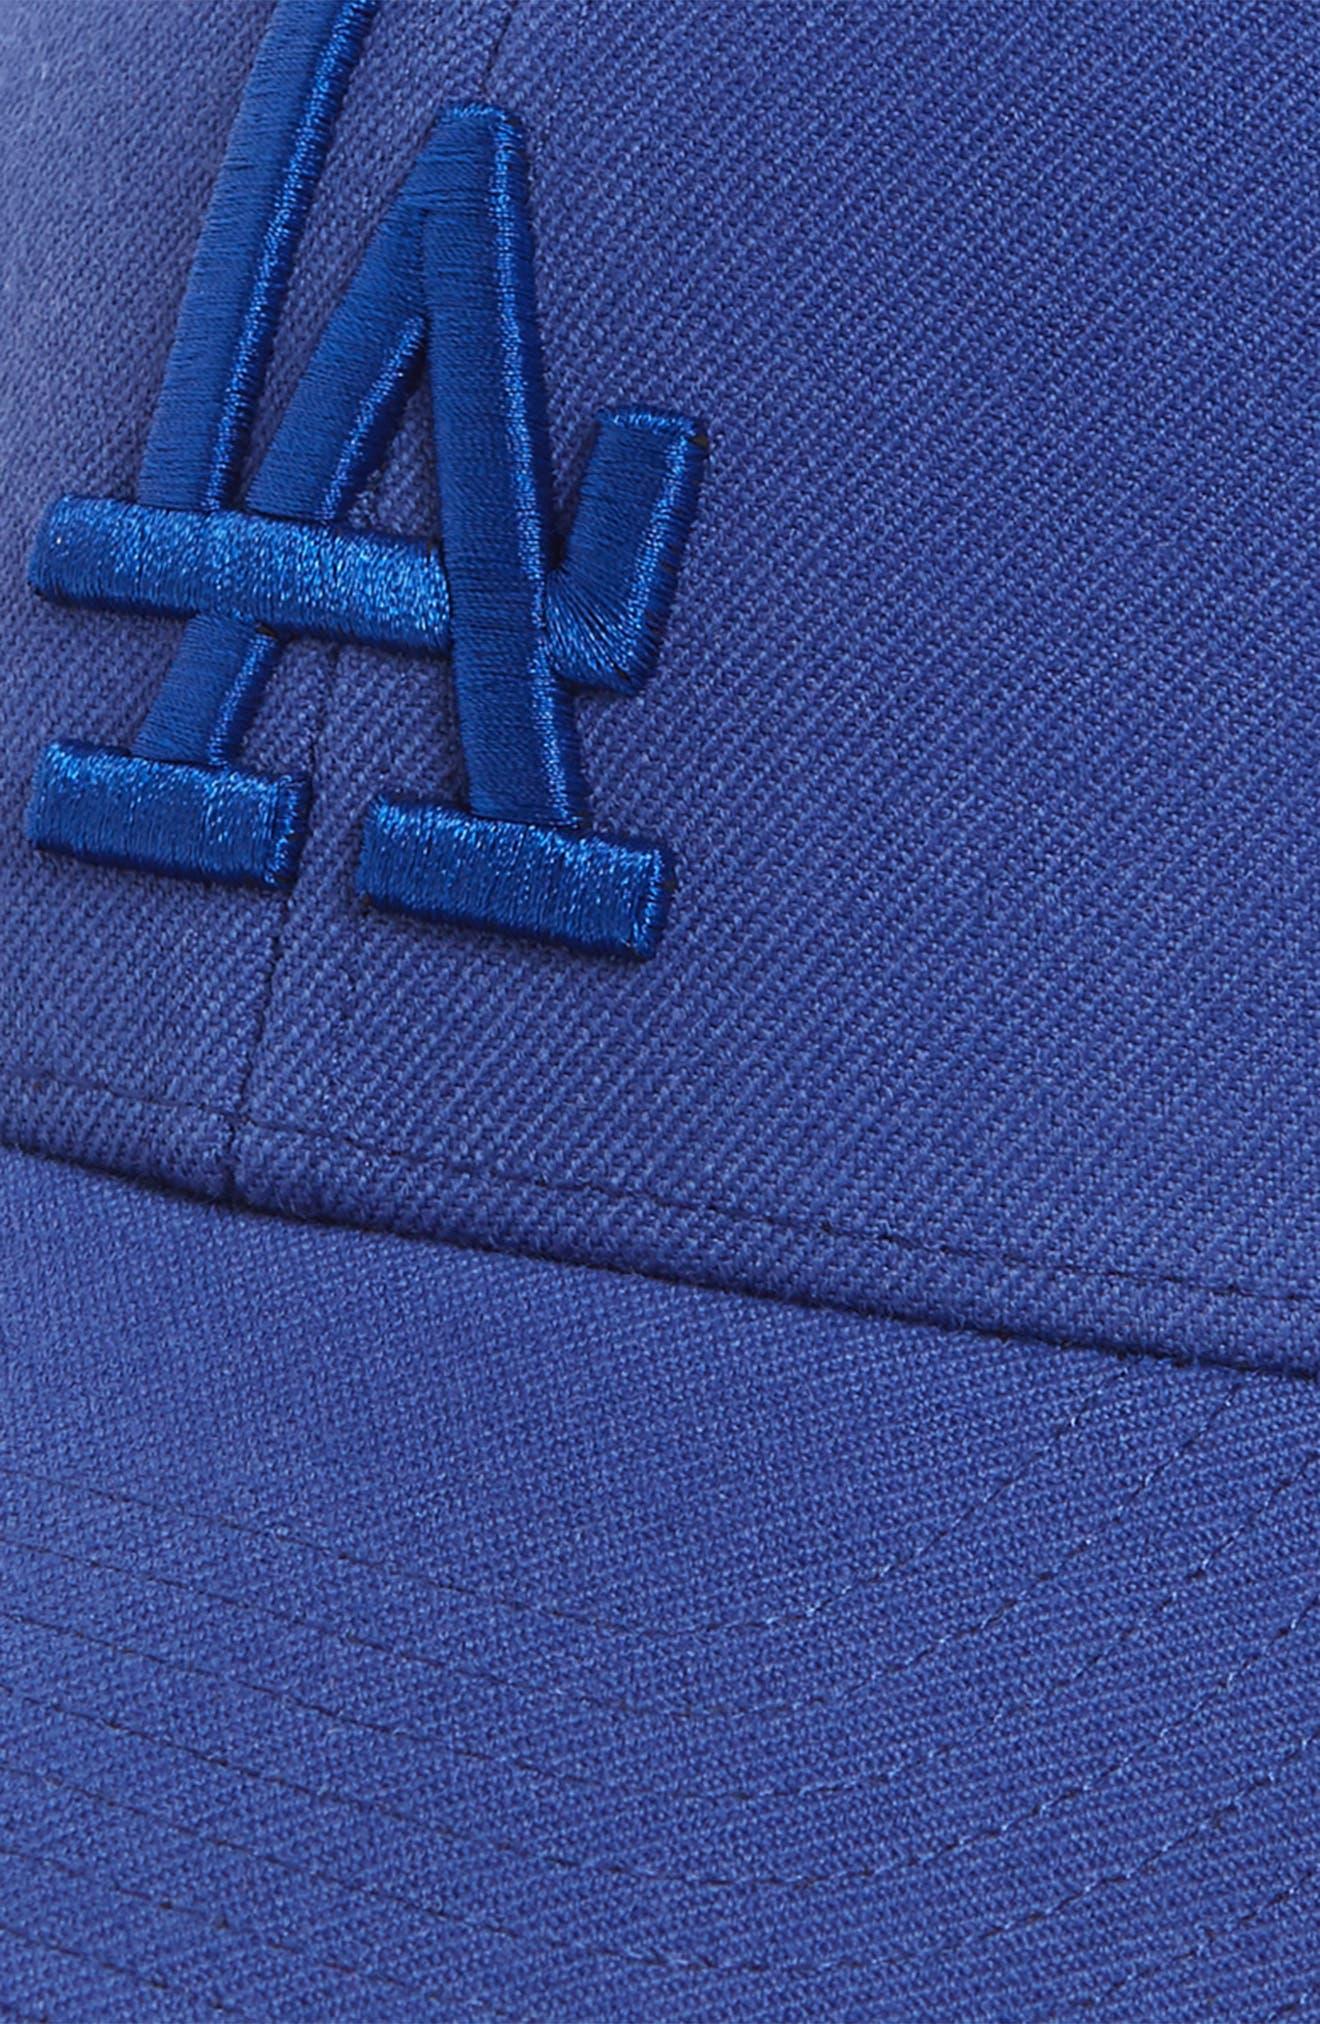 MVP LA Dodgers Baseball Cap,                             Alternate thumbnail 3, color,                             400